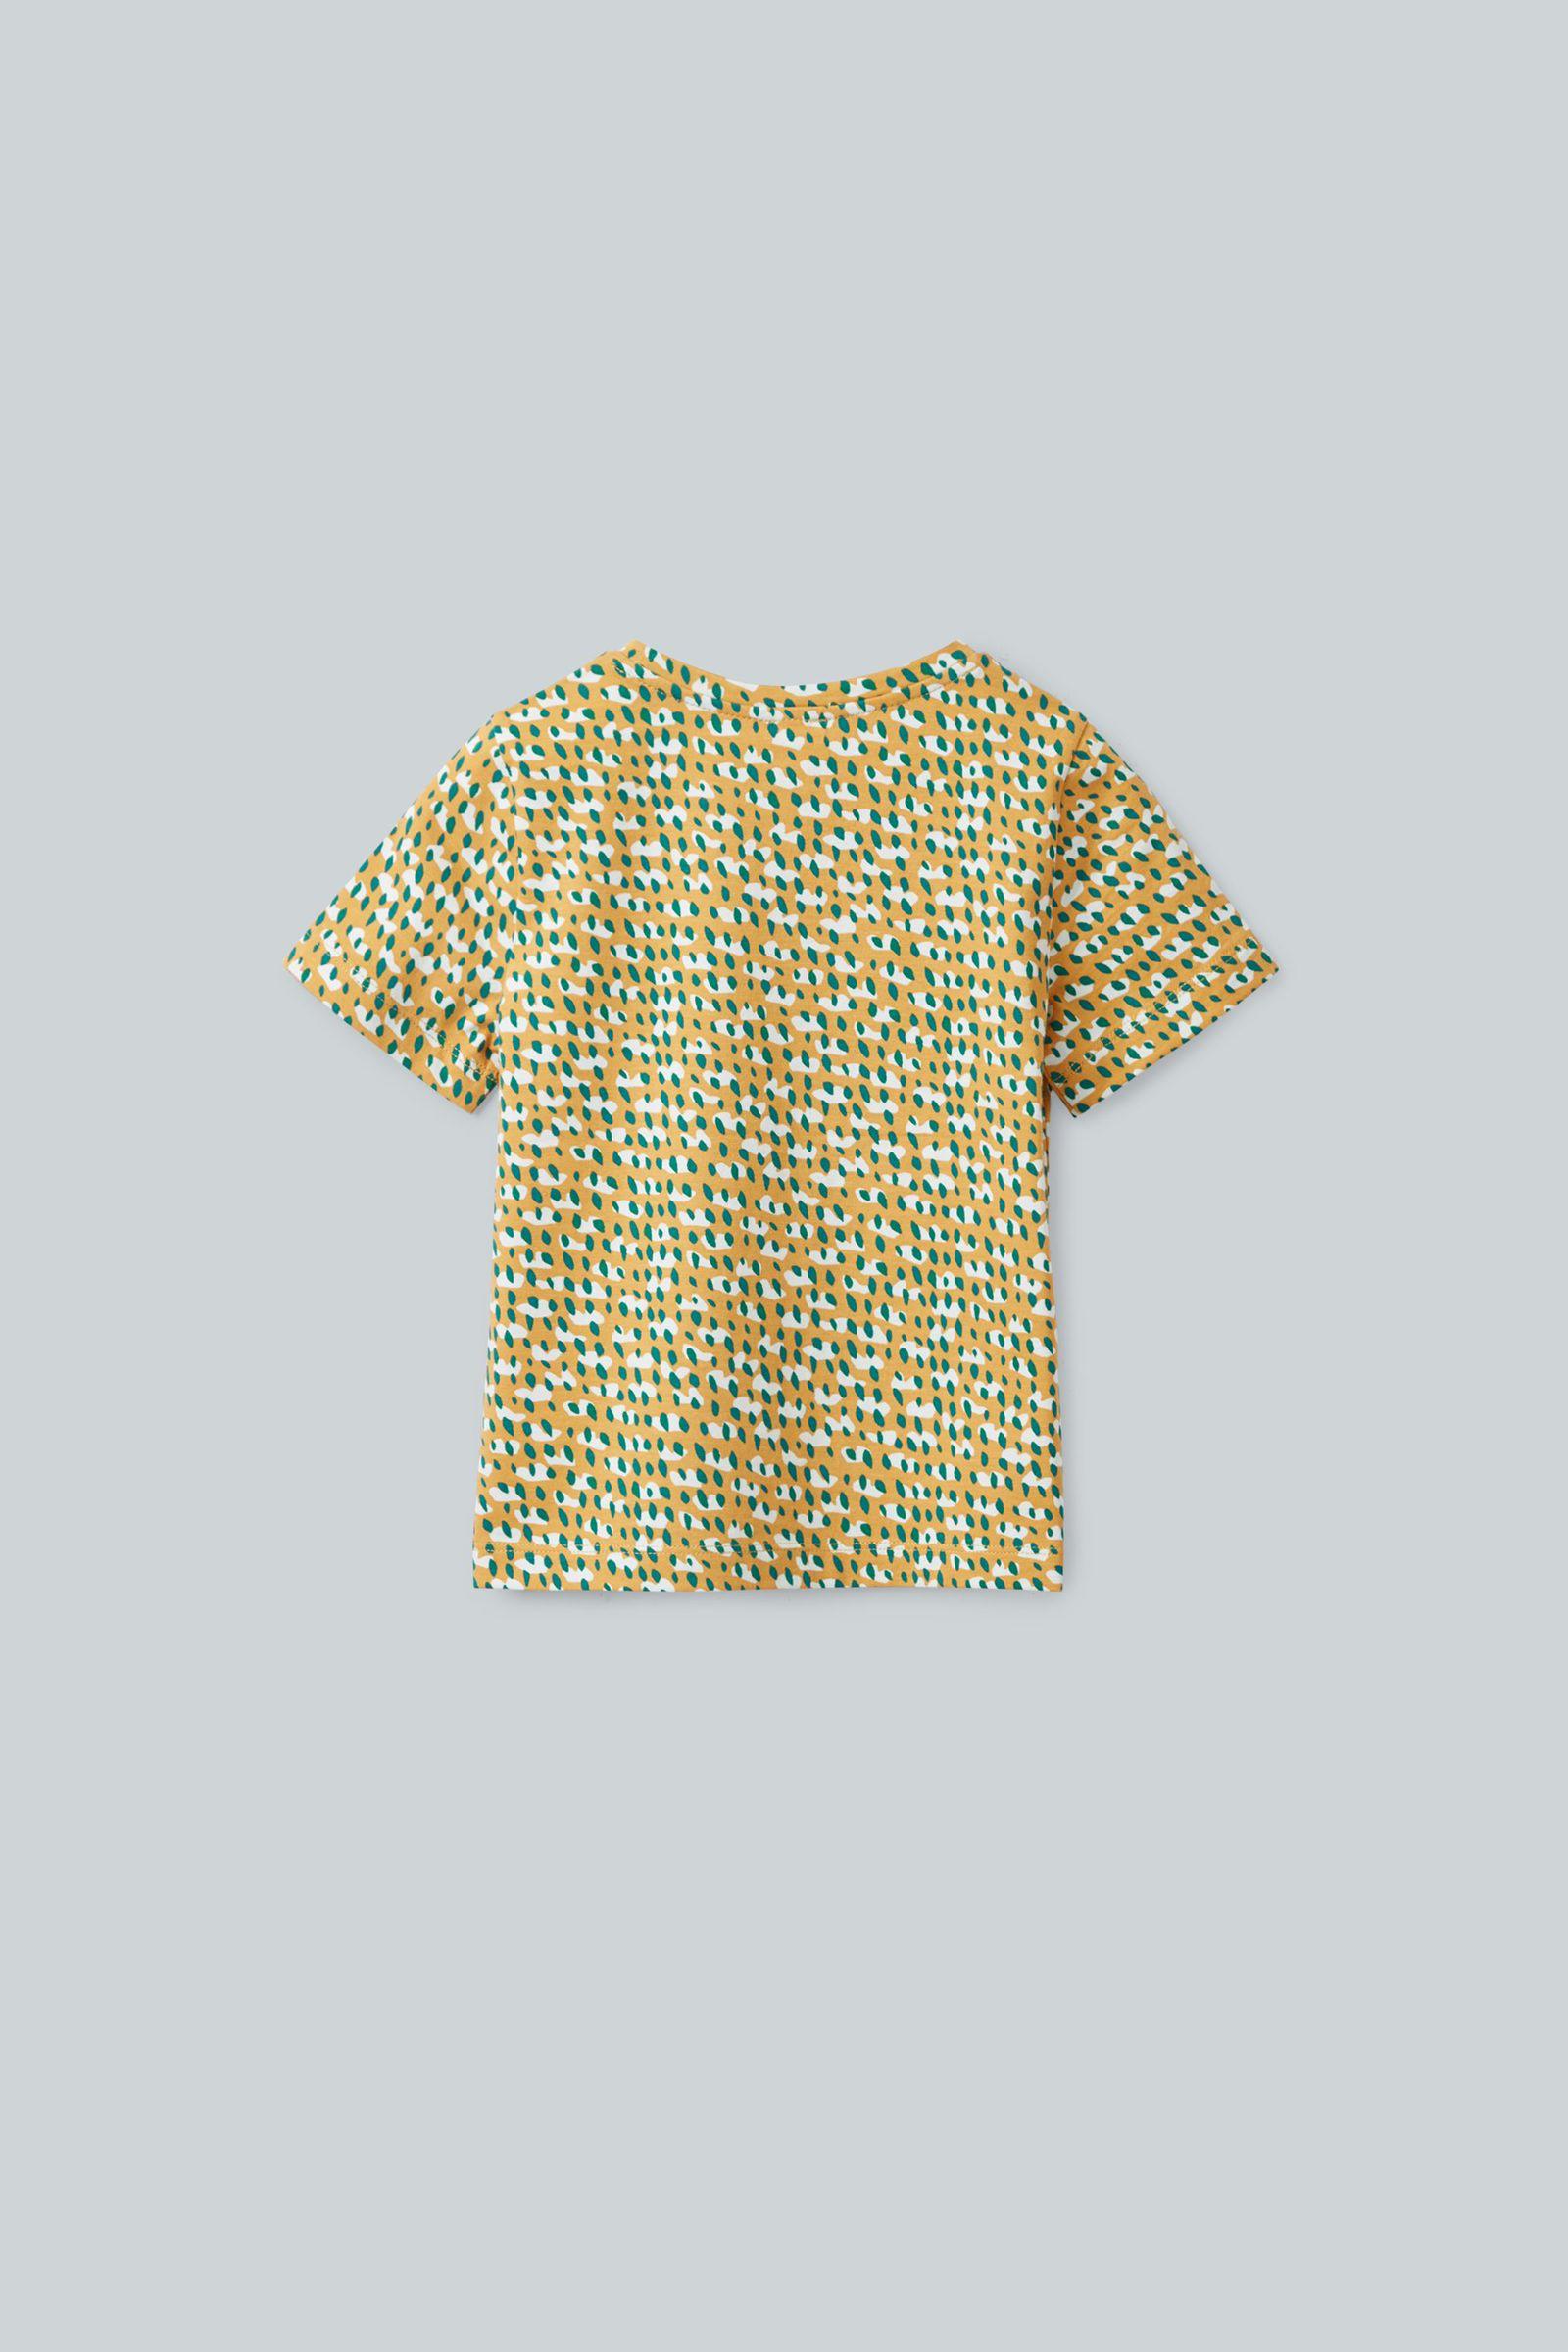 COS 프린티드 오가닉 코튼 티셔츠의 옐로우 / 그린 / 화이트컬러 Product입니다.